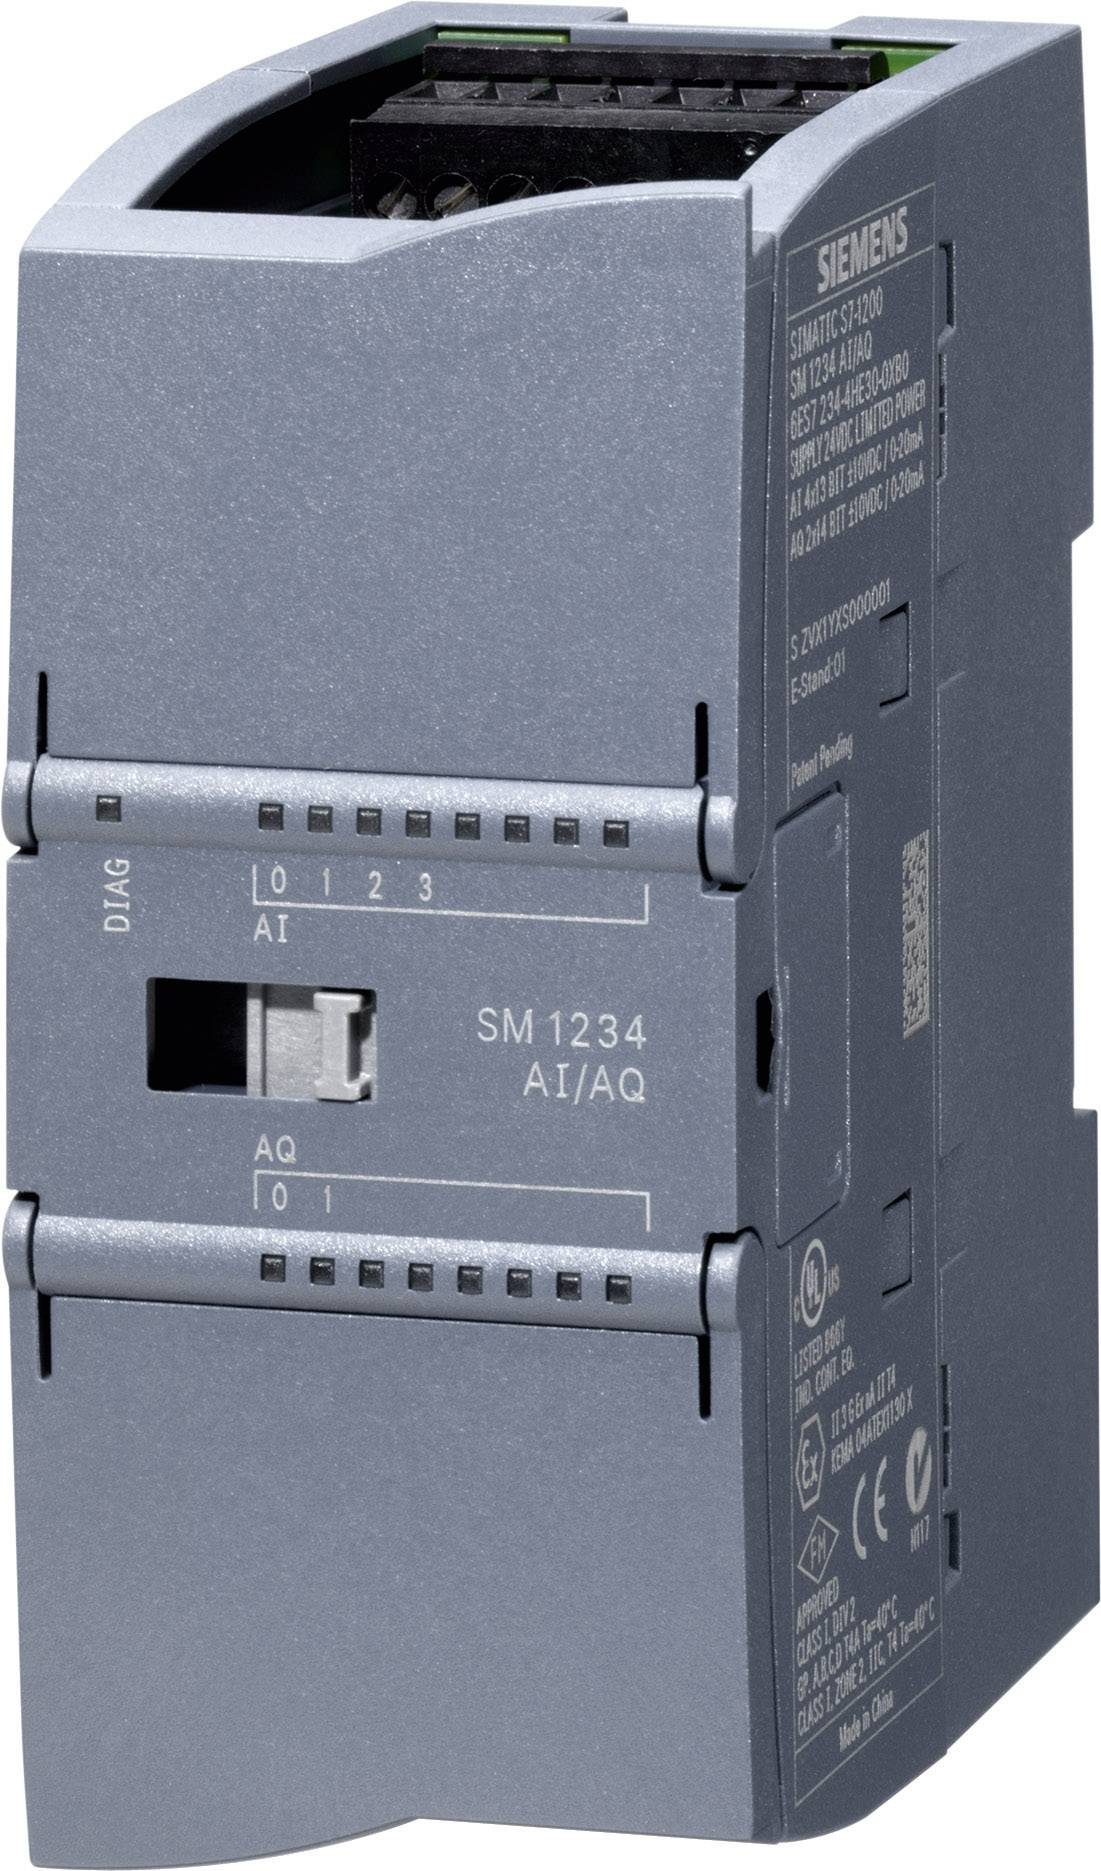 Rozšiřovací PLC modul Siemens SM 1234 (6ES7234-4HE32-0XB0)